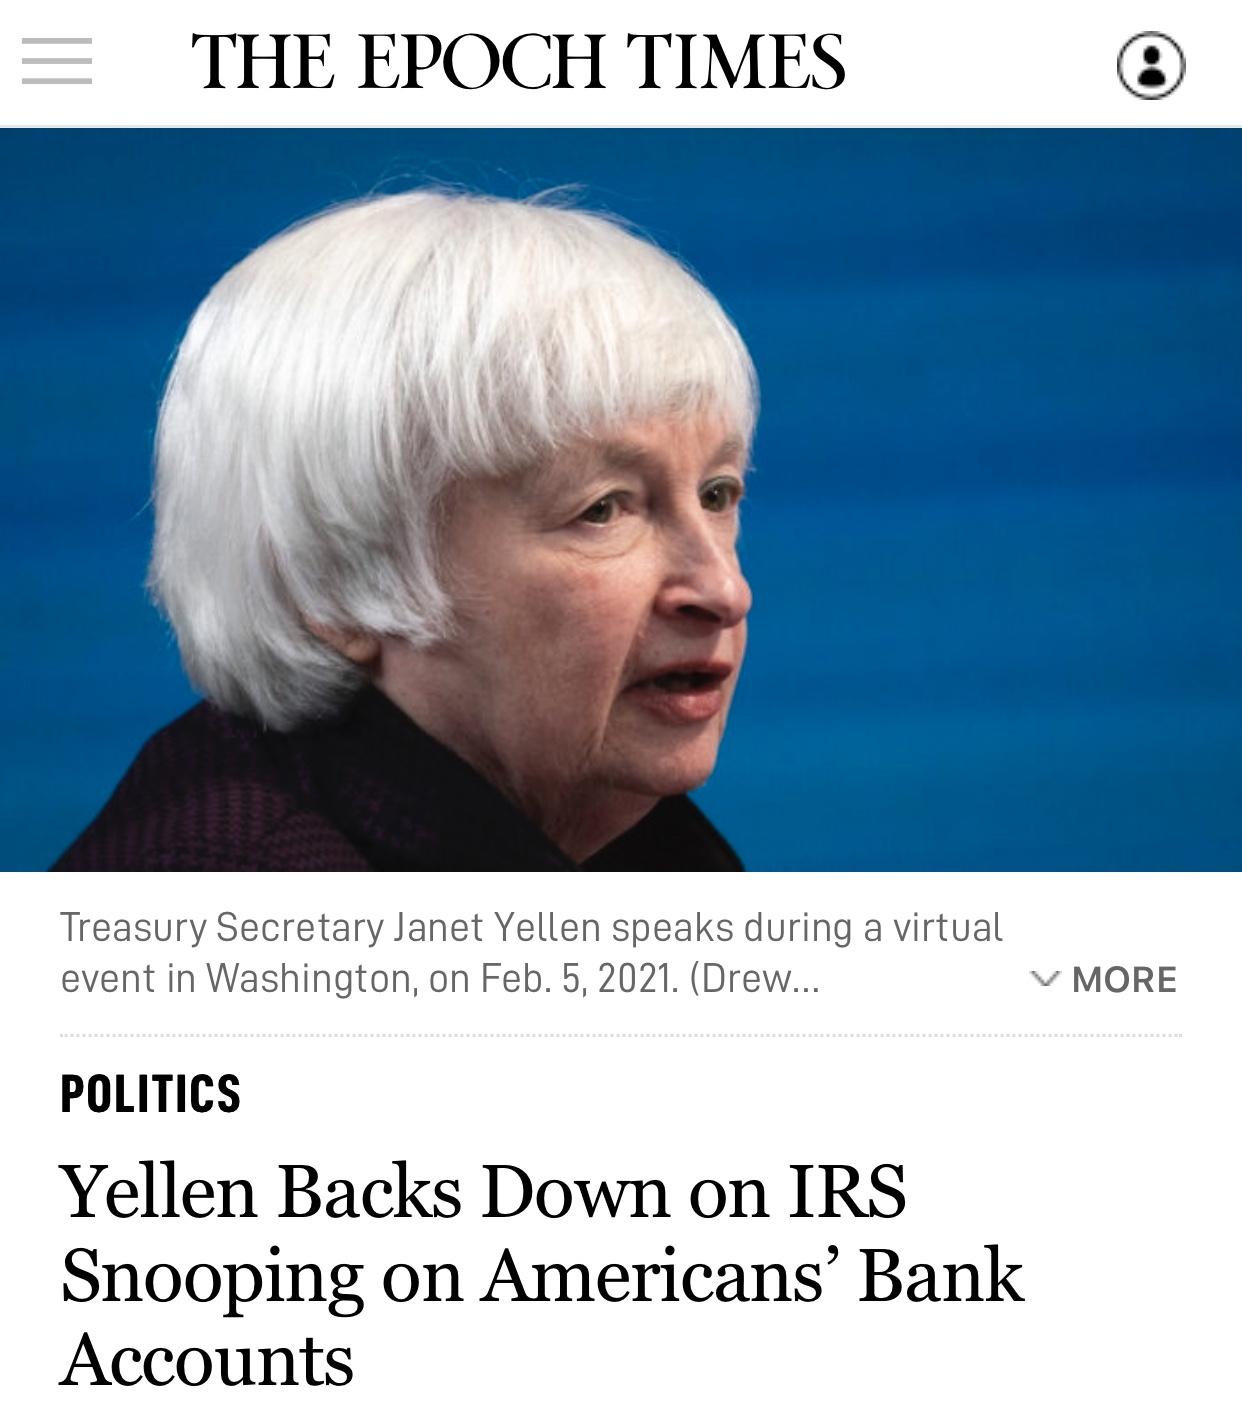 State Treasury Secretary Yellen Backs Down on IRS Snooping on Americans' Bank Accounts